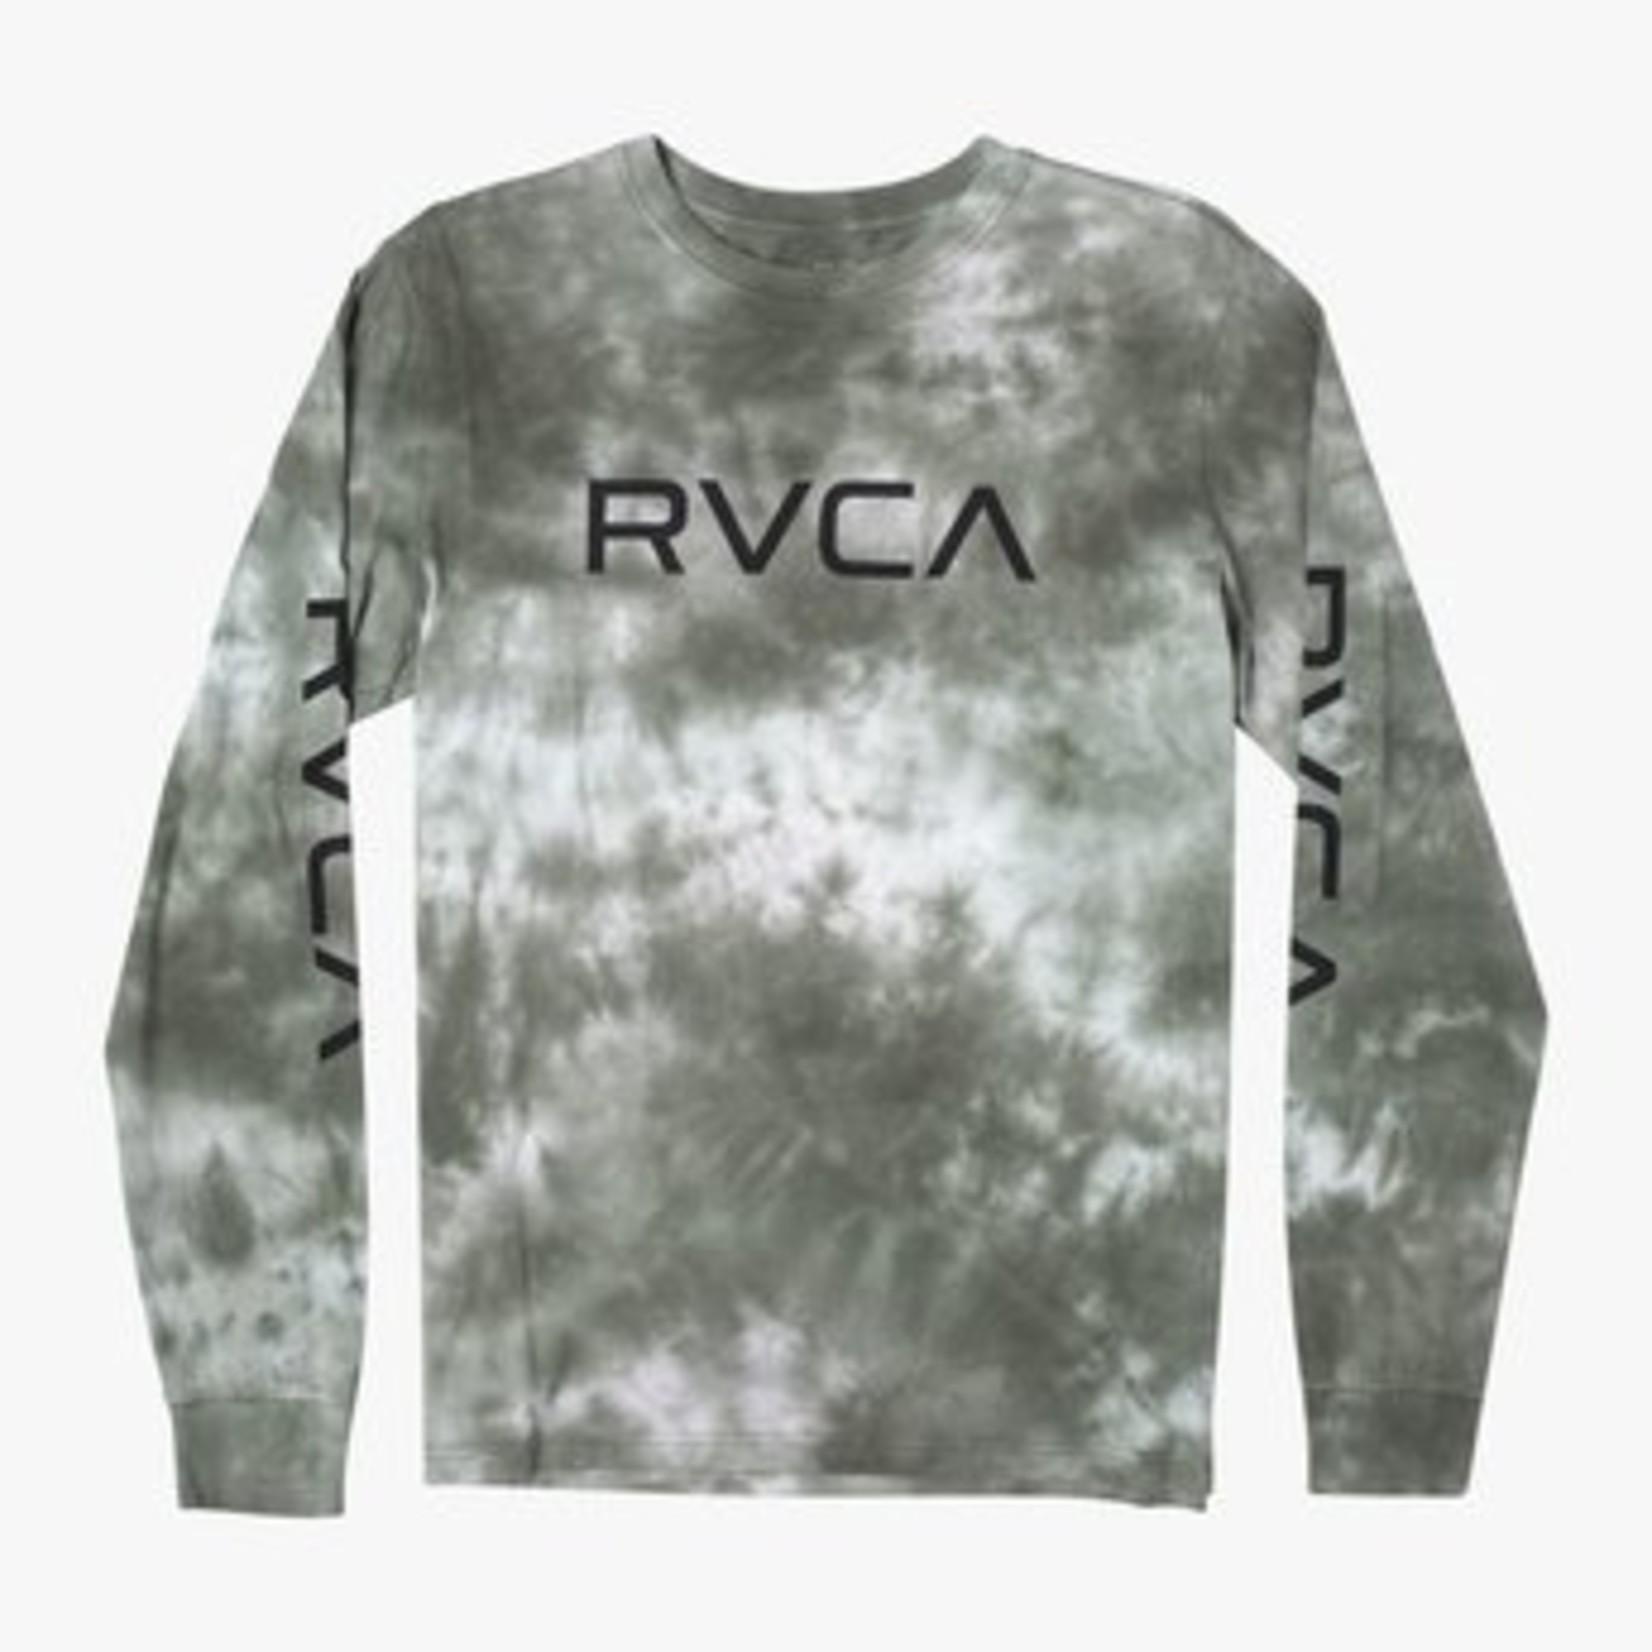 RVCA Big RVCA Tie Dye